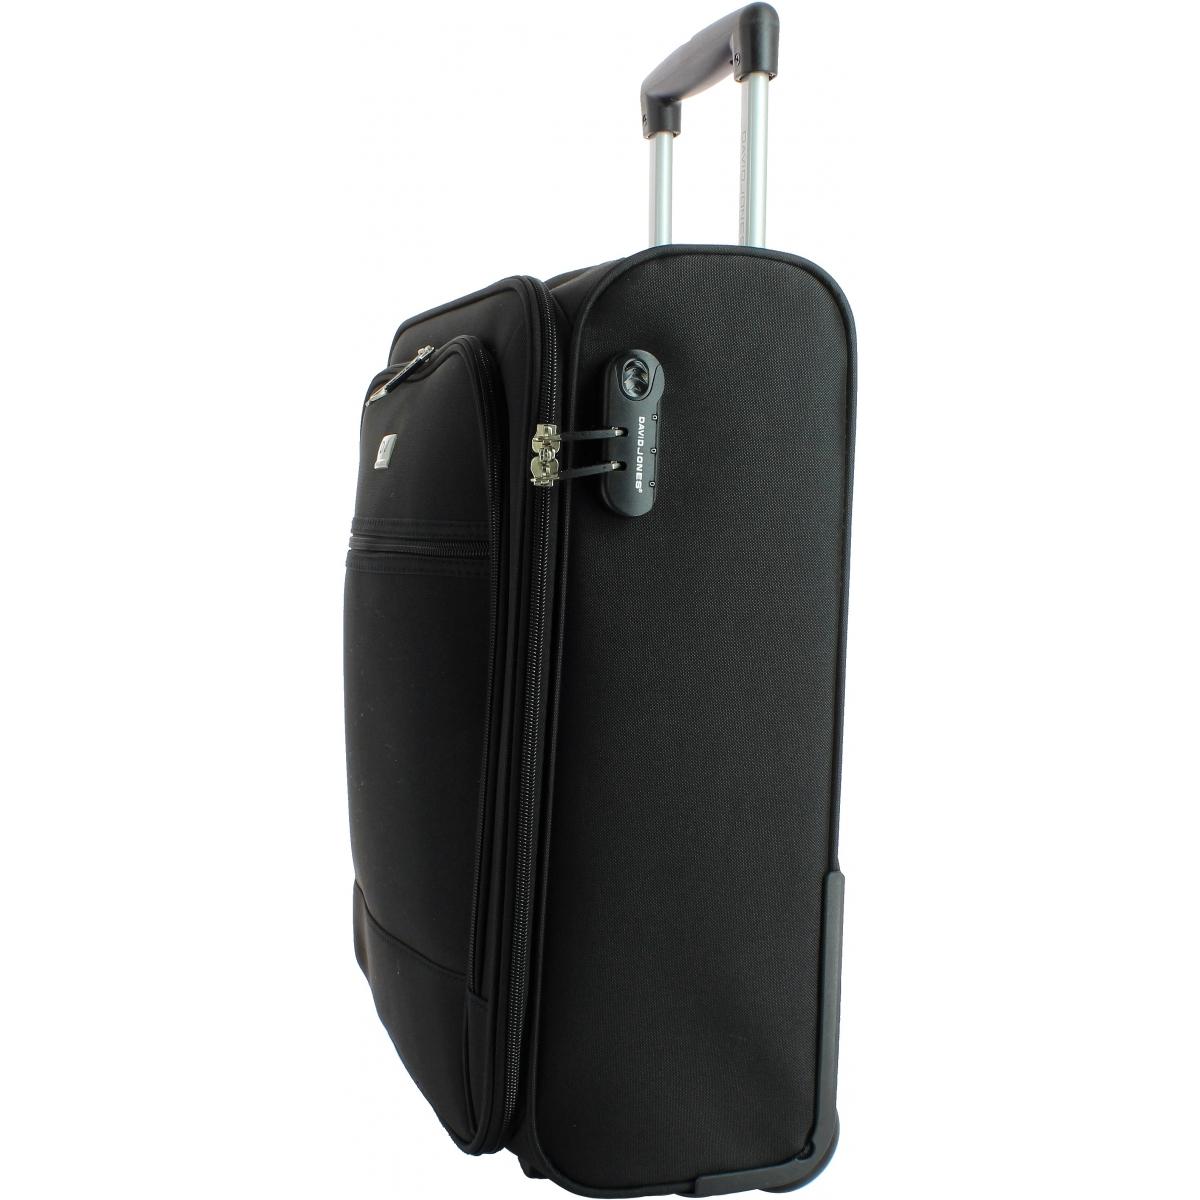 valise cabine souple david jones 50cm r20031p couleur. Black Bedroom Furniture Sets. Home Design Ideas